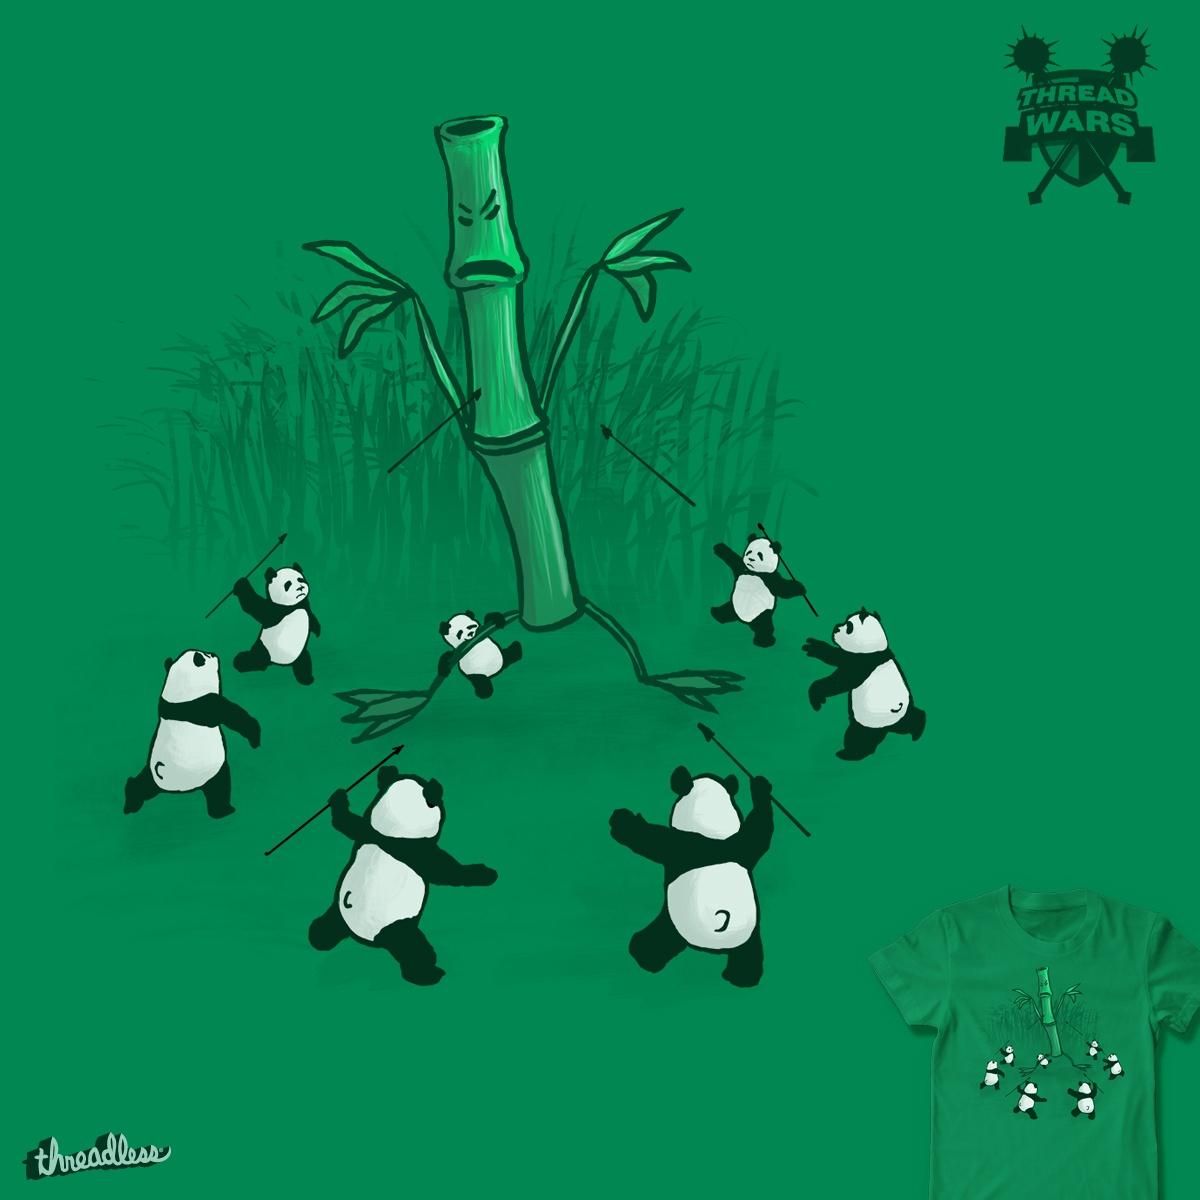 Bamboo Battle Bear Brigade by Pyne on Threadless